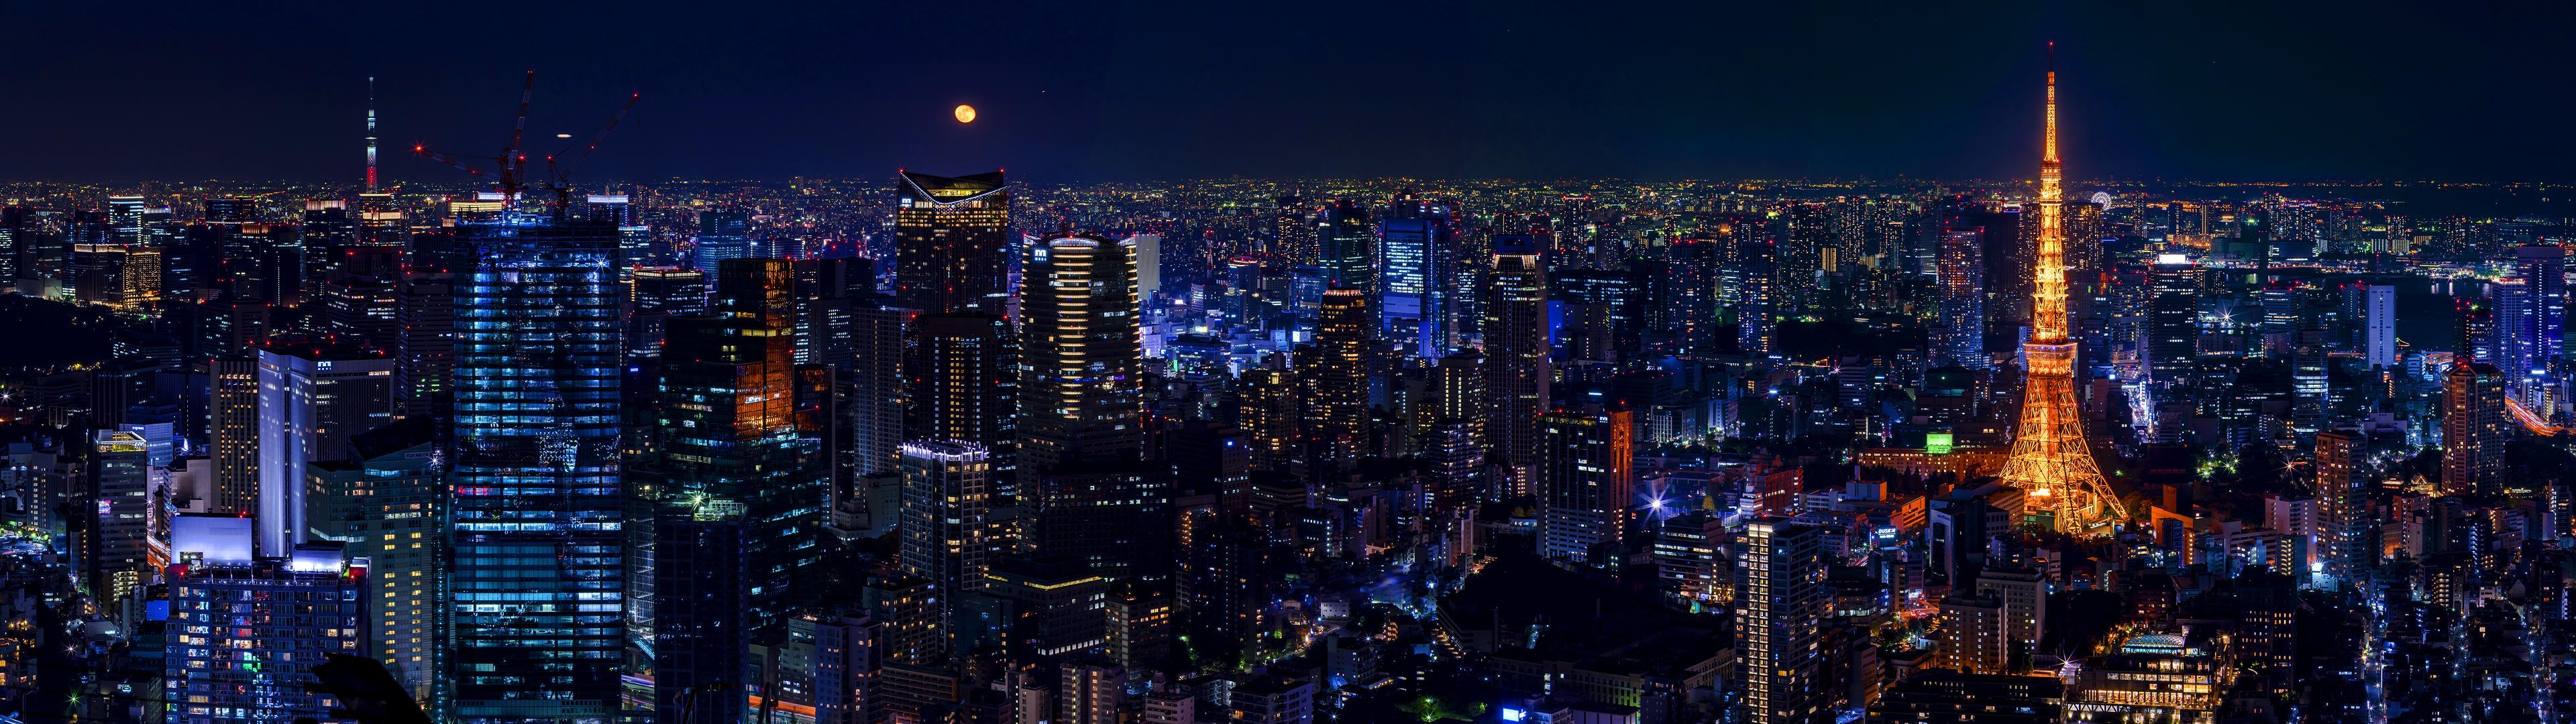 Tokyo Hd Wallpaper Background Image 3840x1080 Id